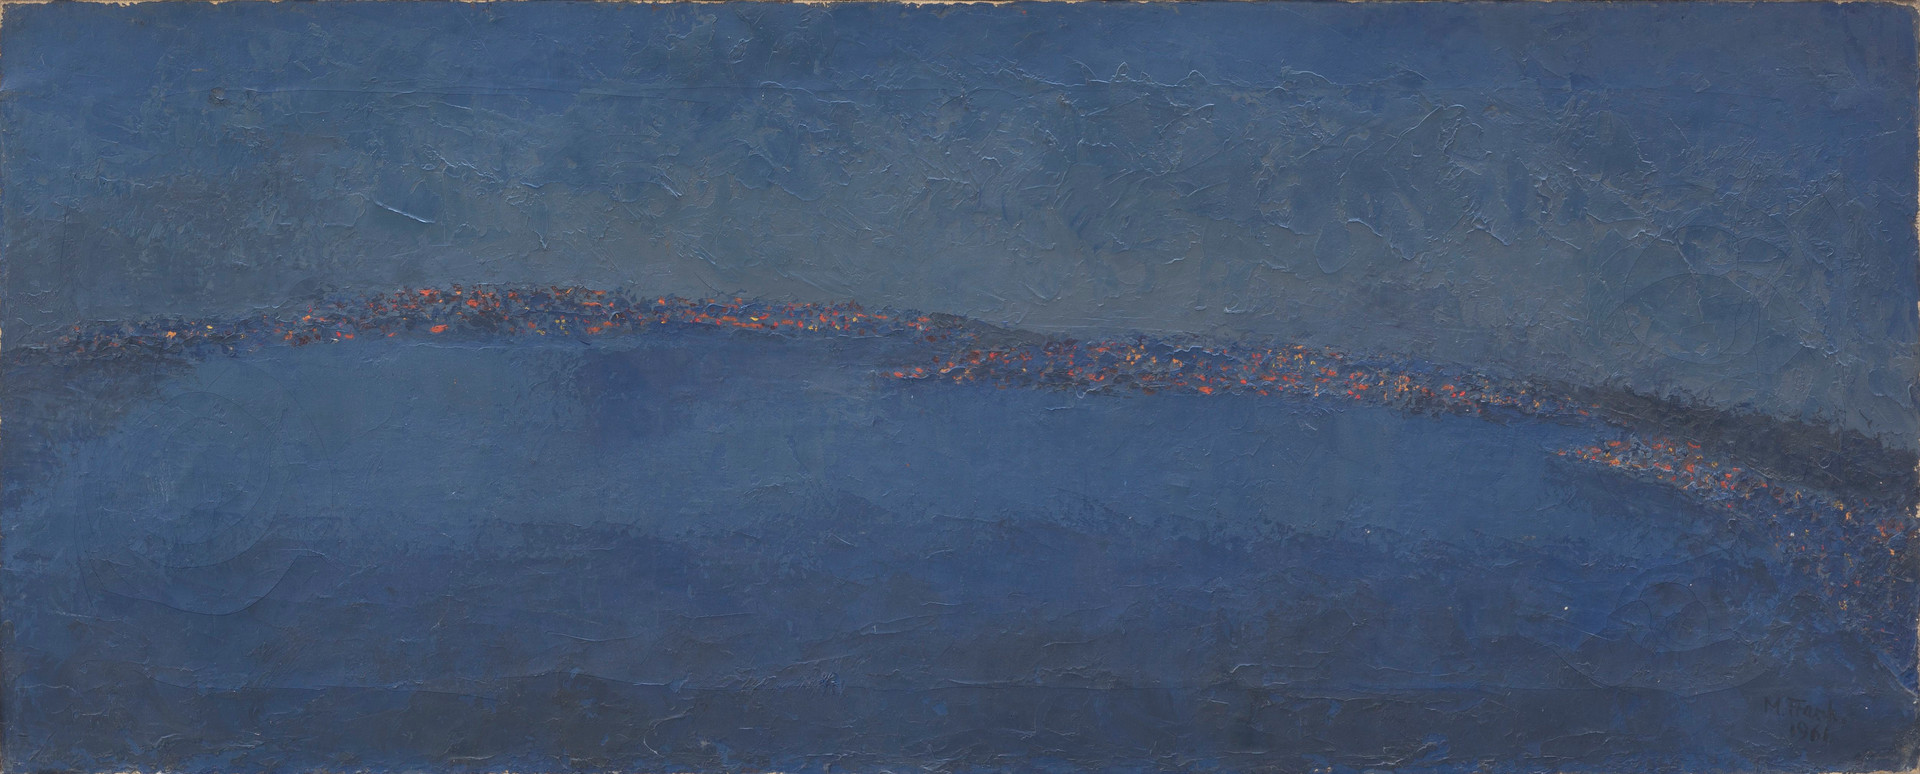 Seattle by Night (Blue Night)